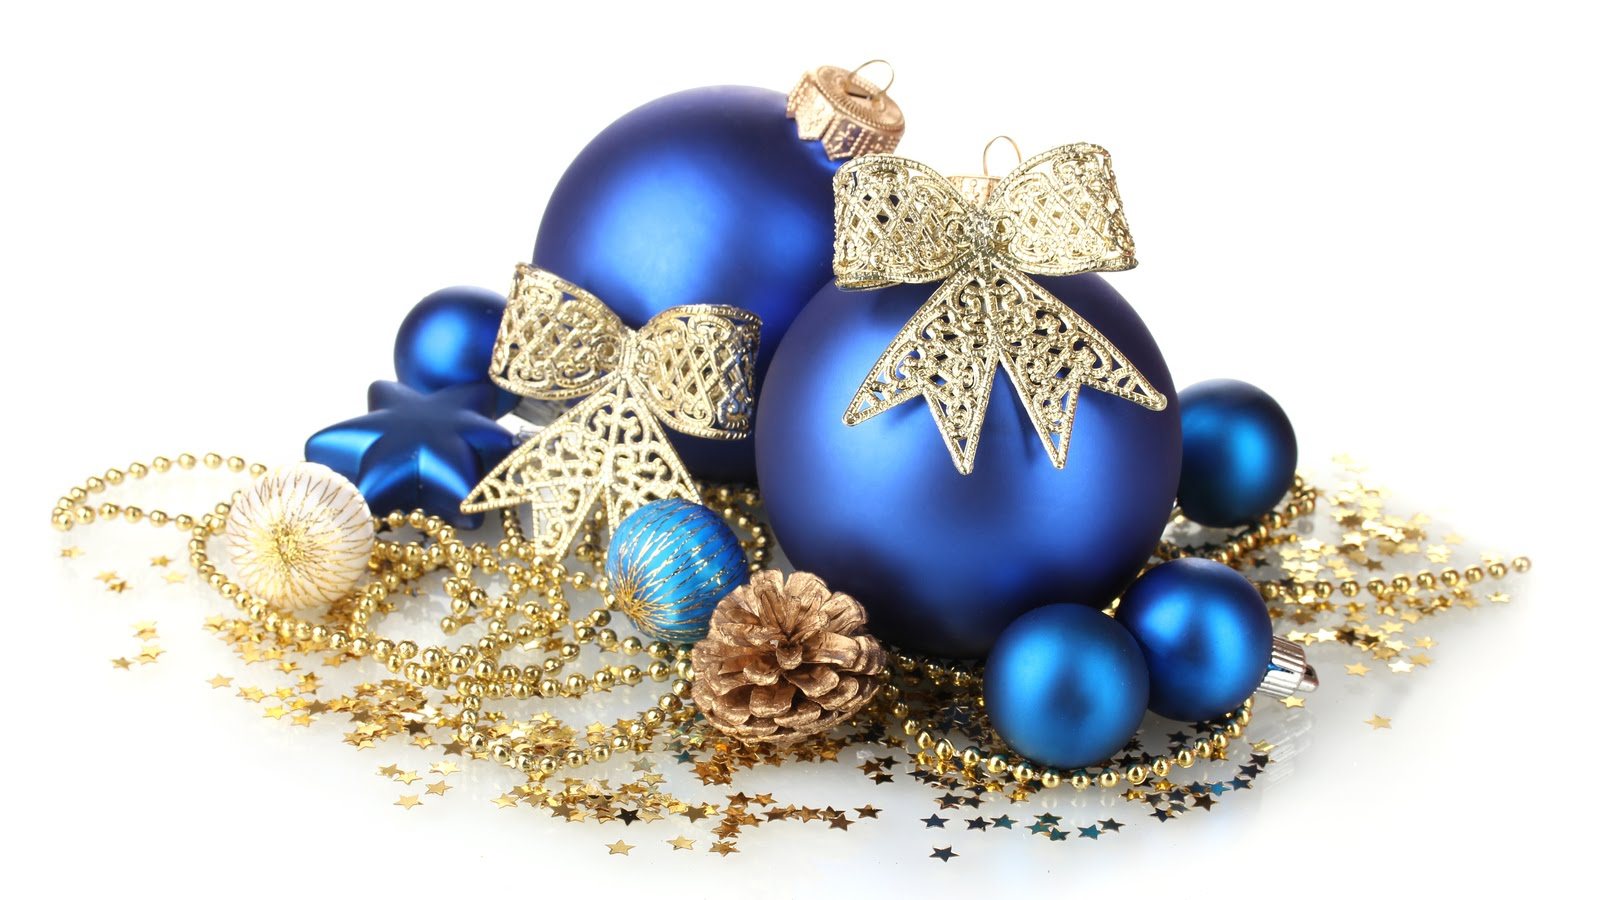 43b2e4a5f4c5e BANCO DE IMÁGENES  Disfruta este lindo fondo navideño con esferas azules